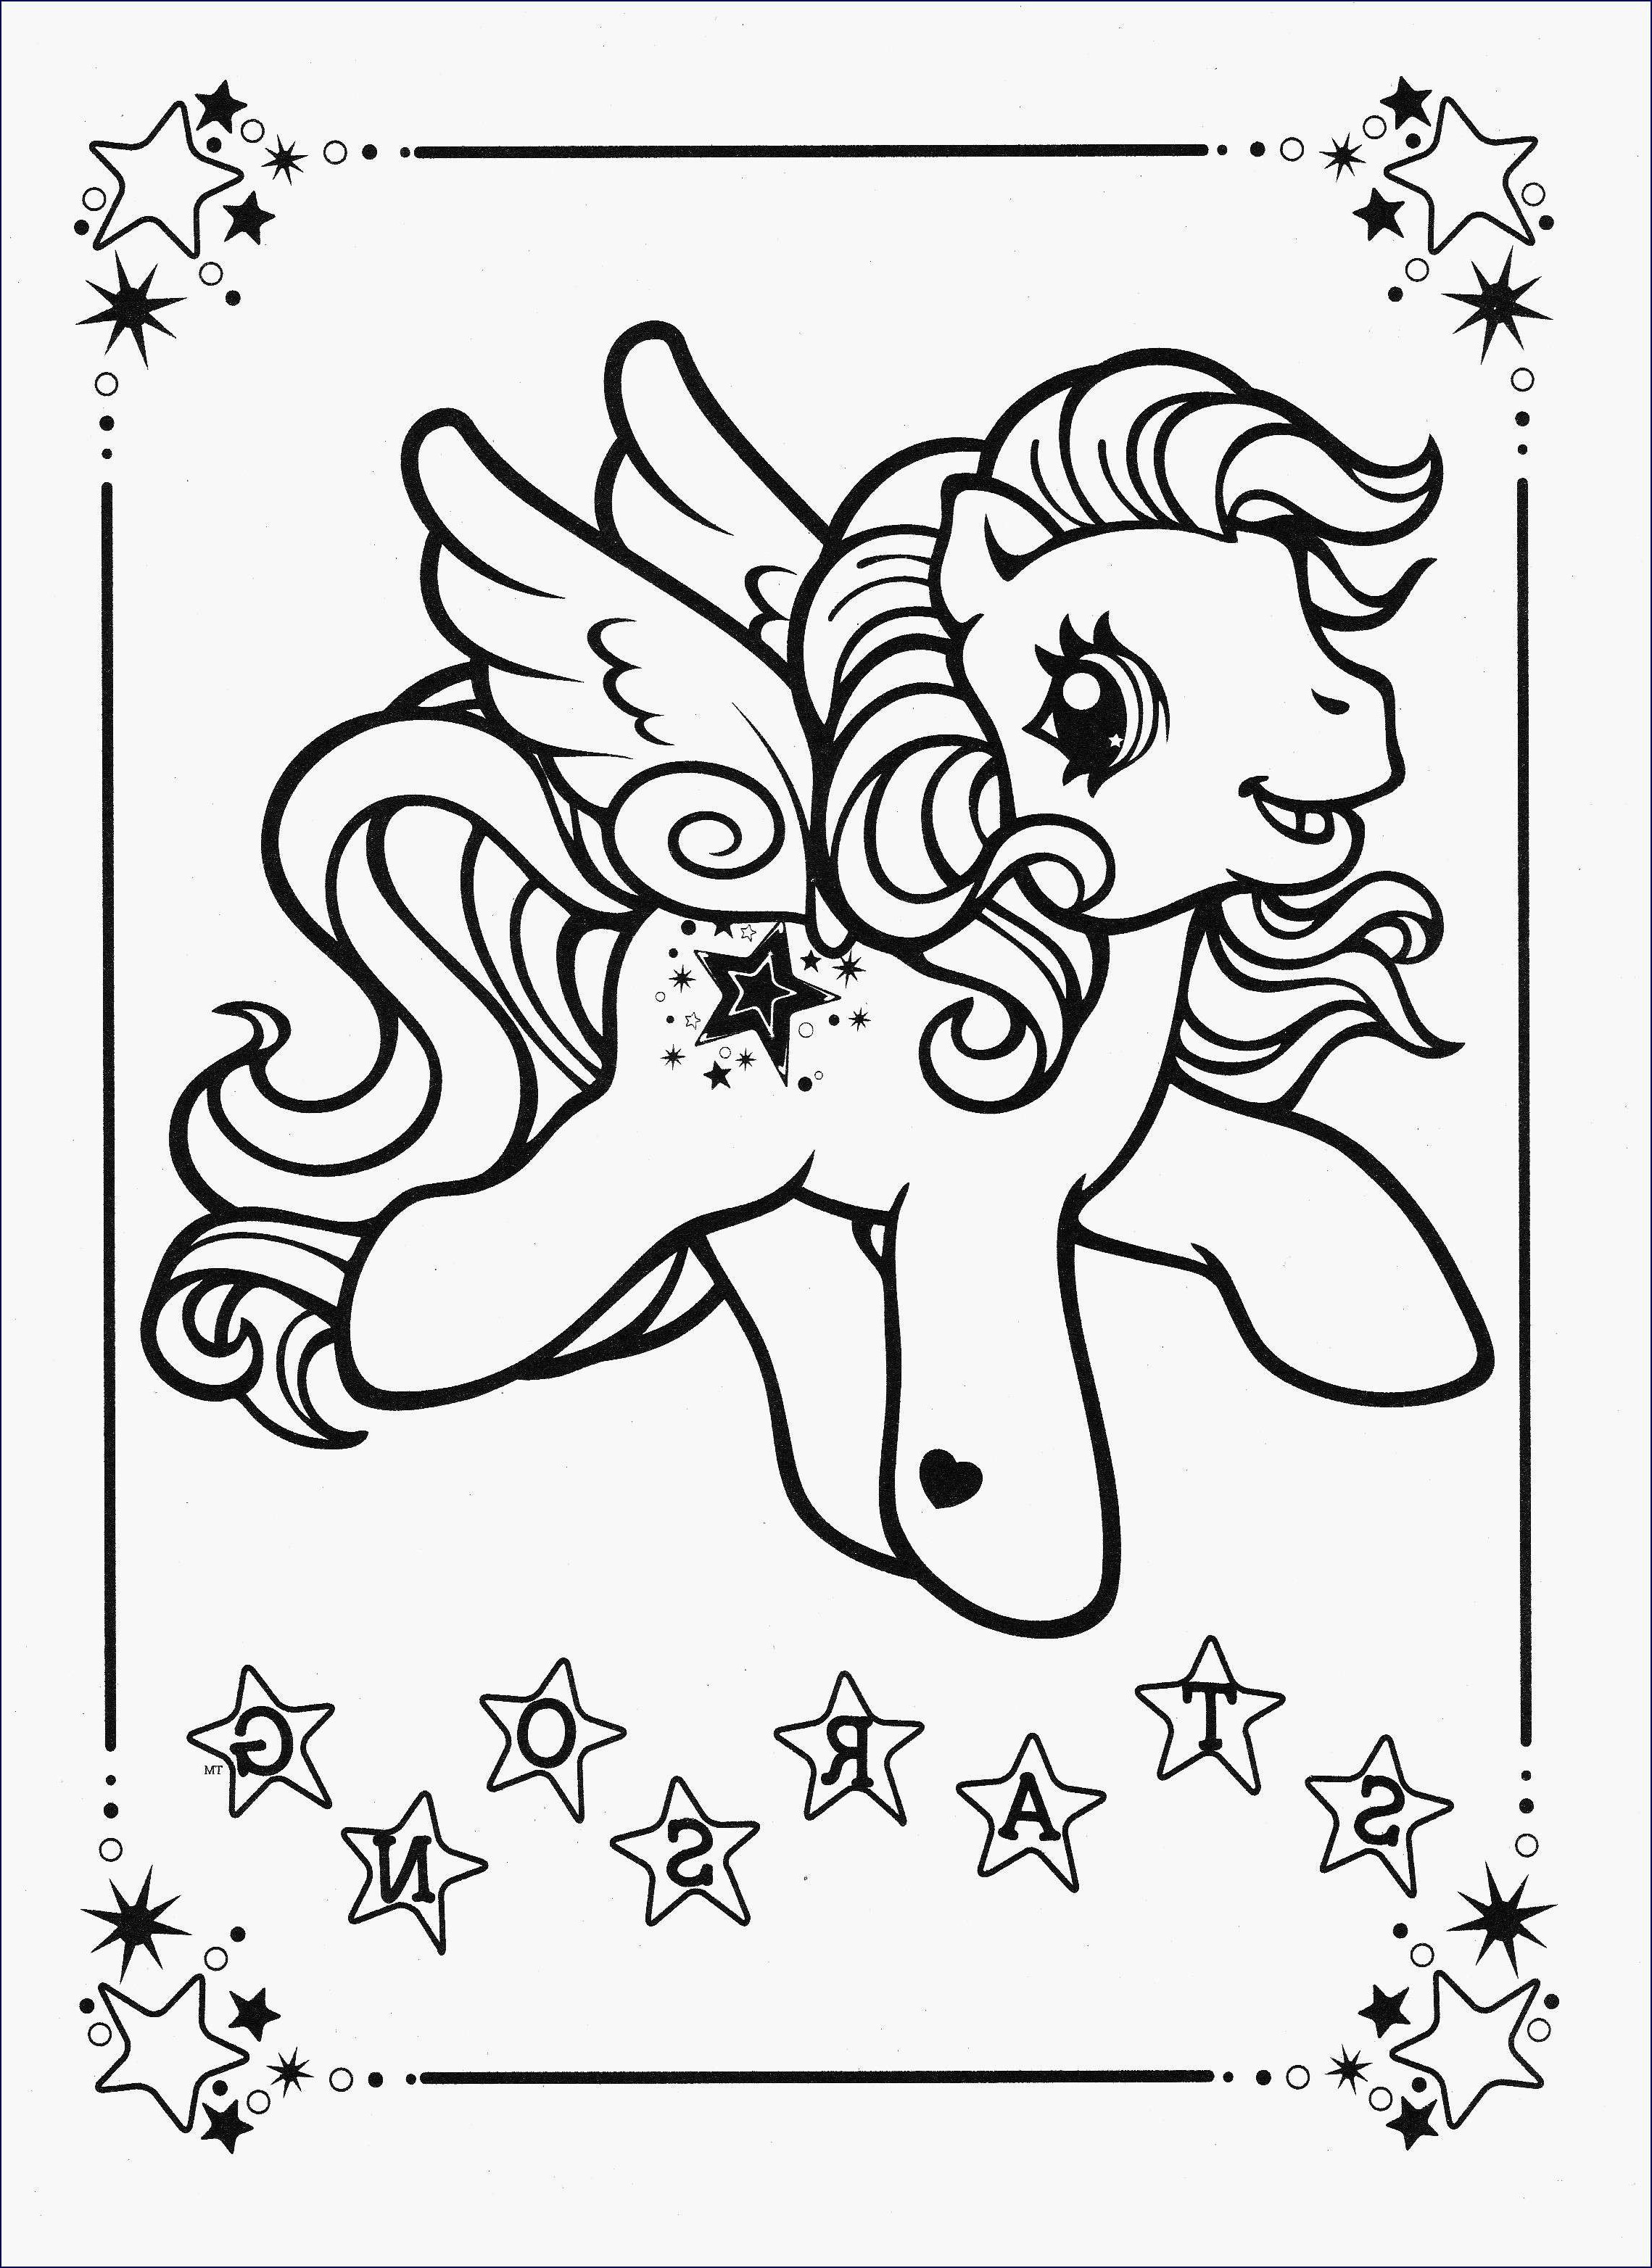 Ausmalbilder My Little Pony Applejack Neu 32 Fantastisch Ausmalbilder My Little Pony – Malvorlagen Ideen Sammlung